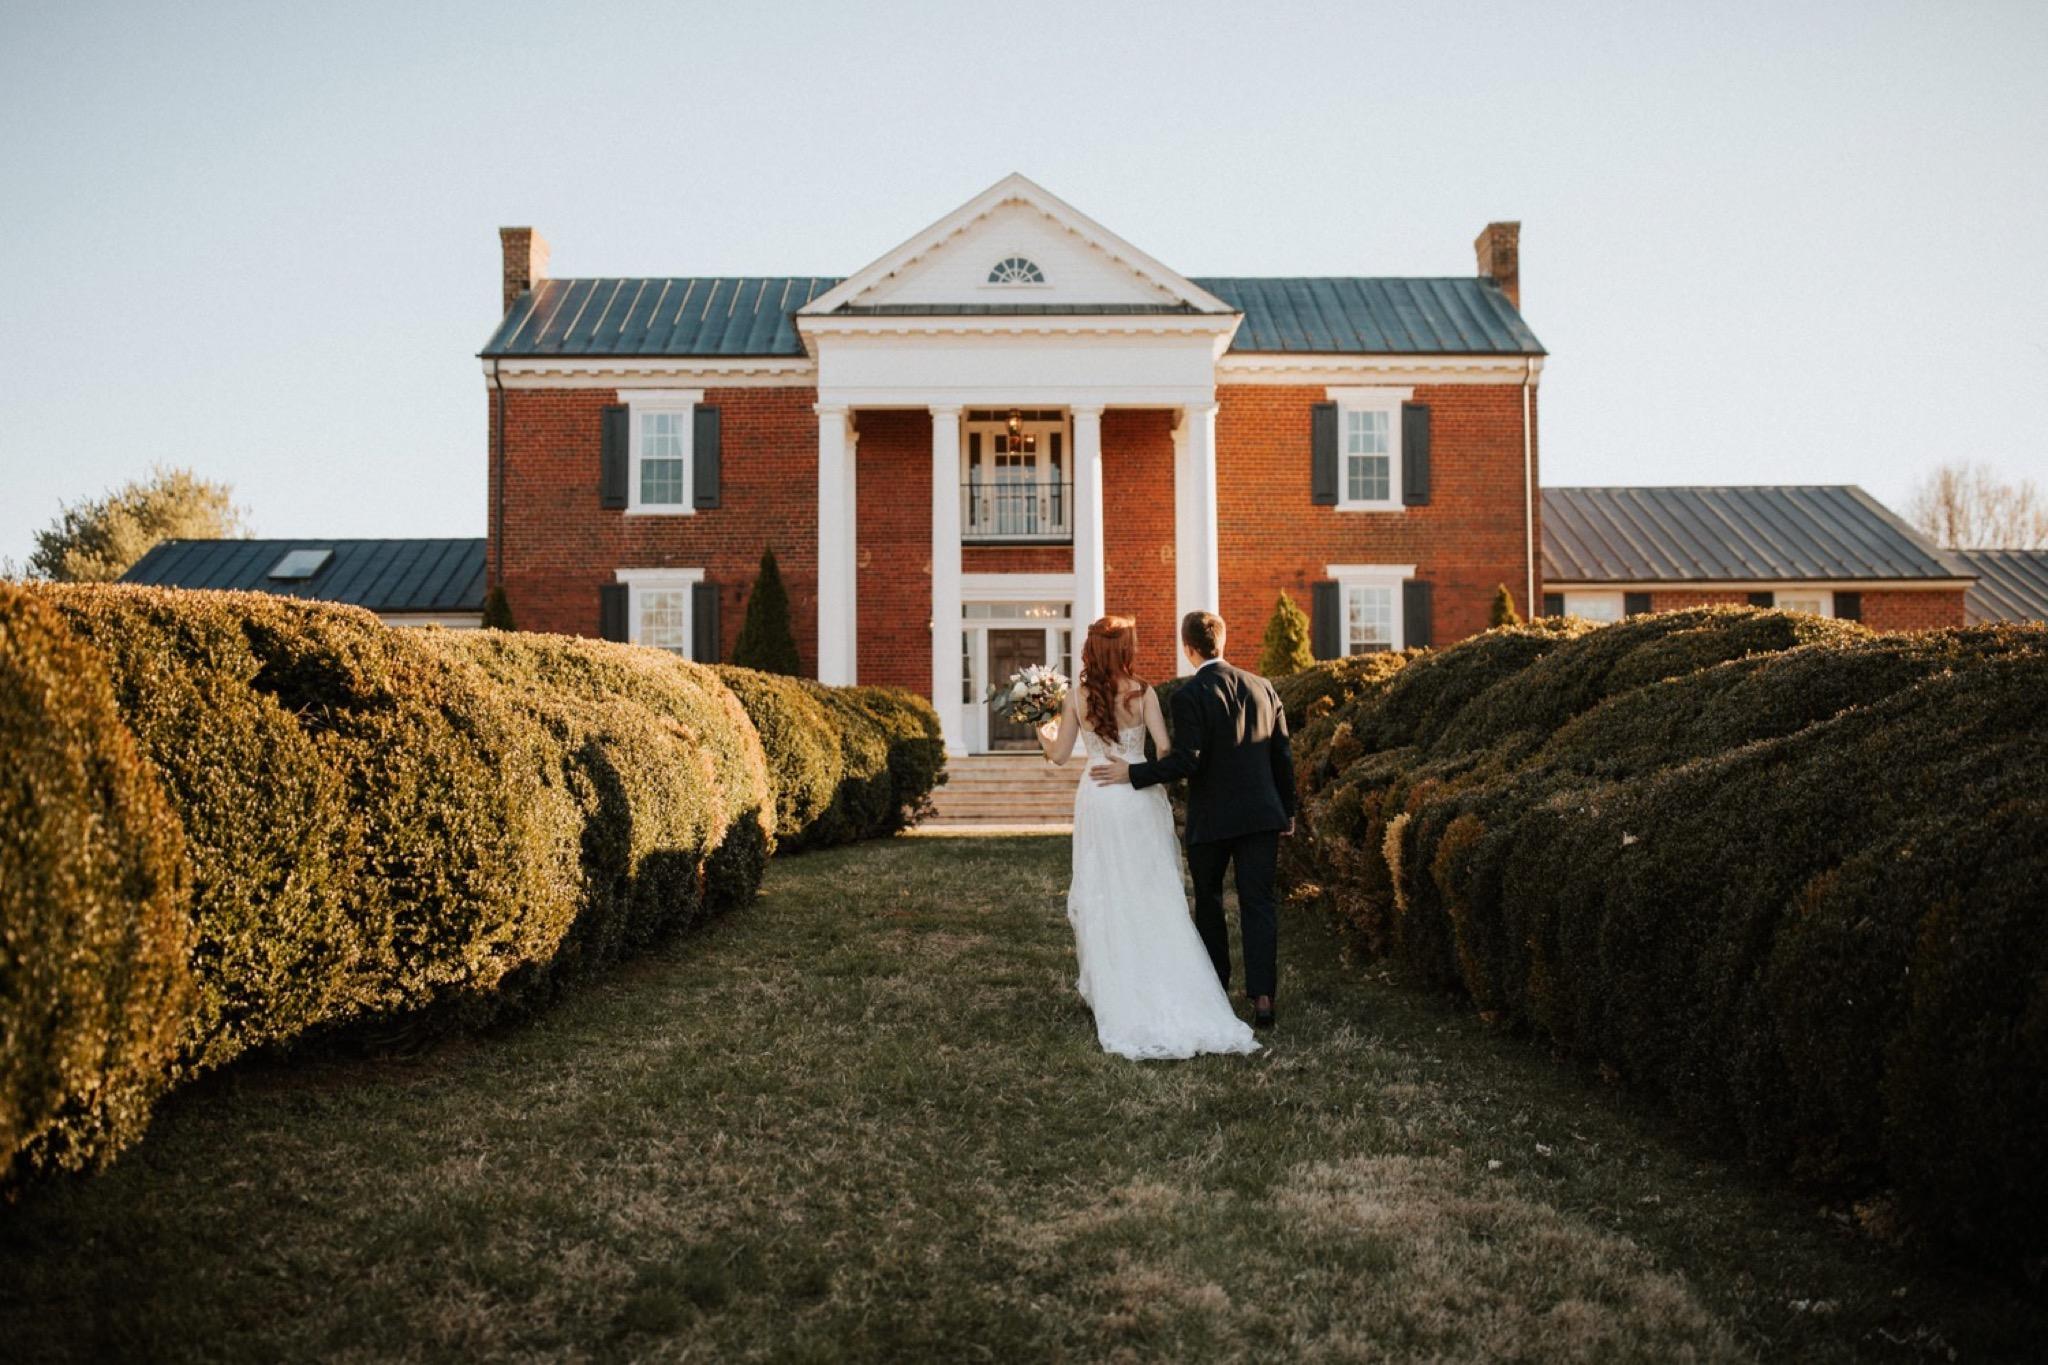 65_West Manor Estate Weddings - Pat Cori Photography-135_romantic_brideandgroom_WestManorEstate_Portraits_VirginiaWeddingPhotographer.jpg